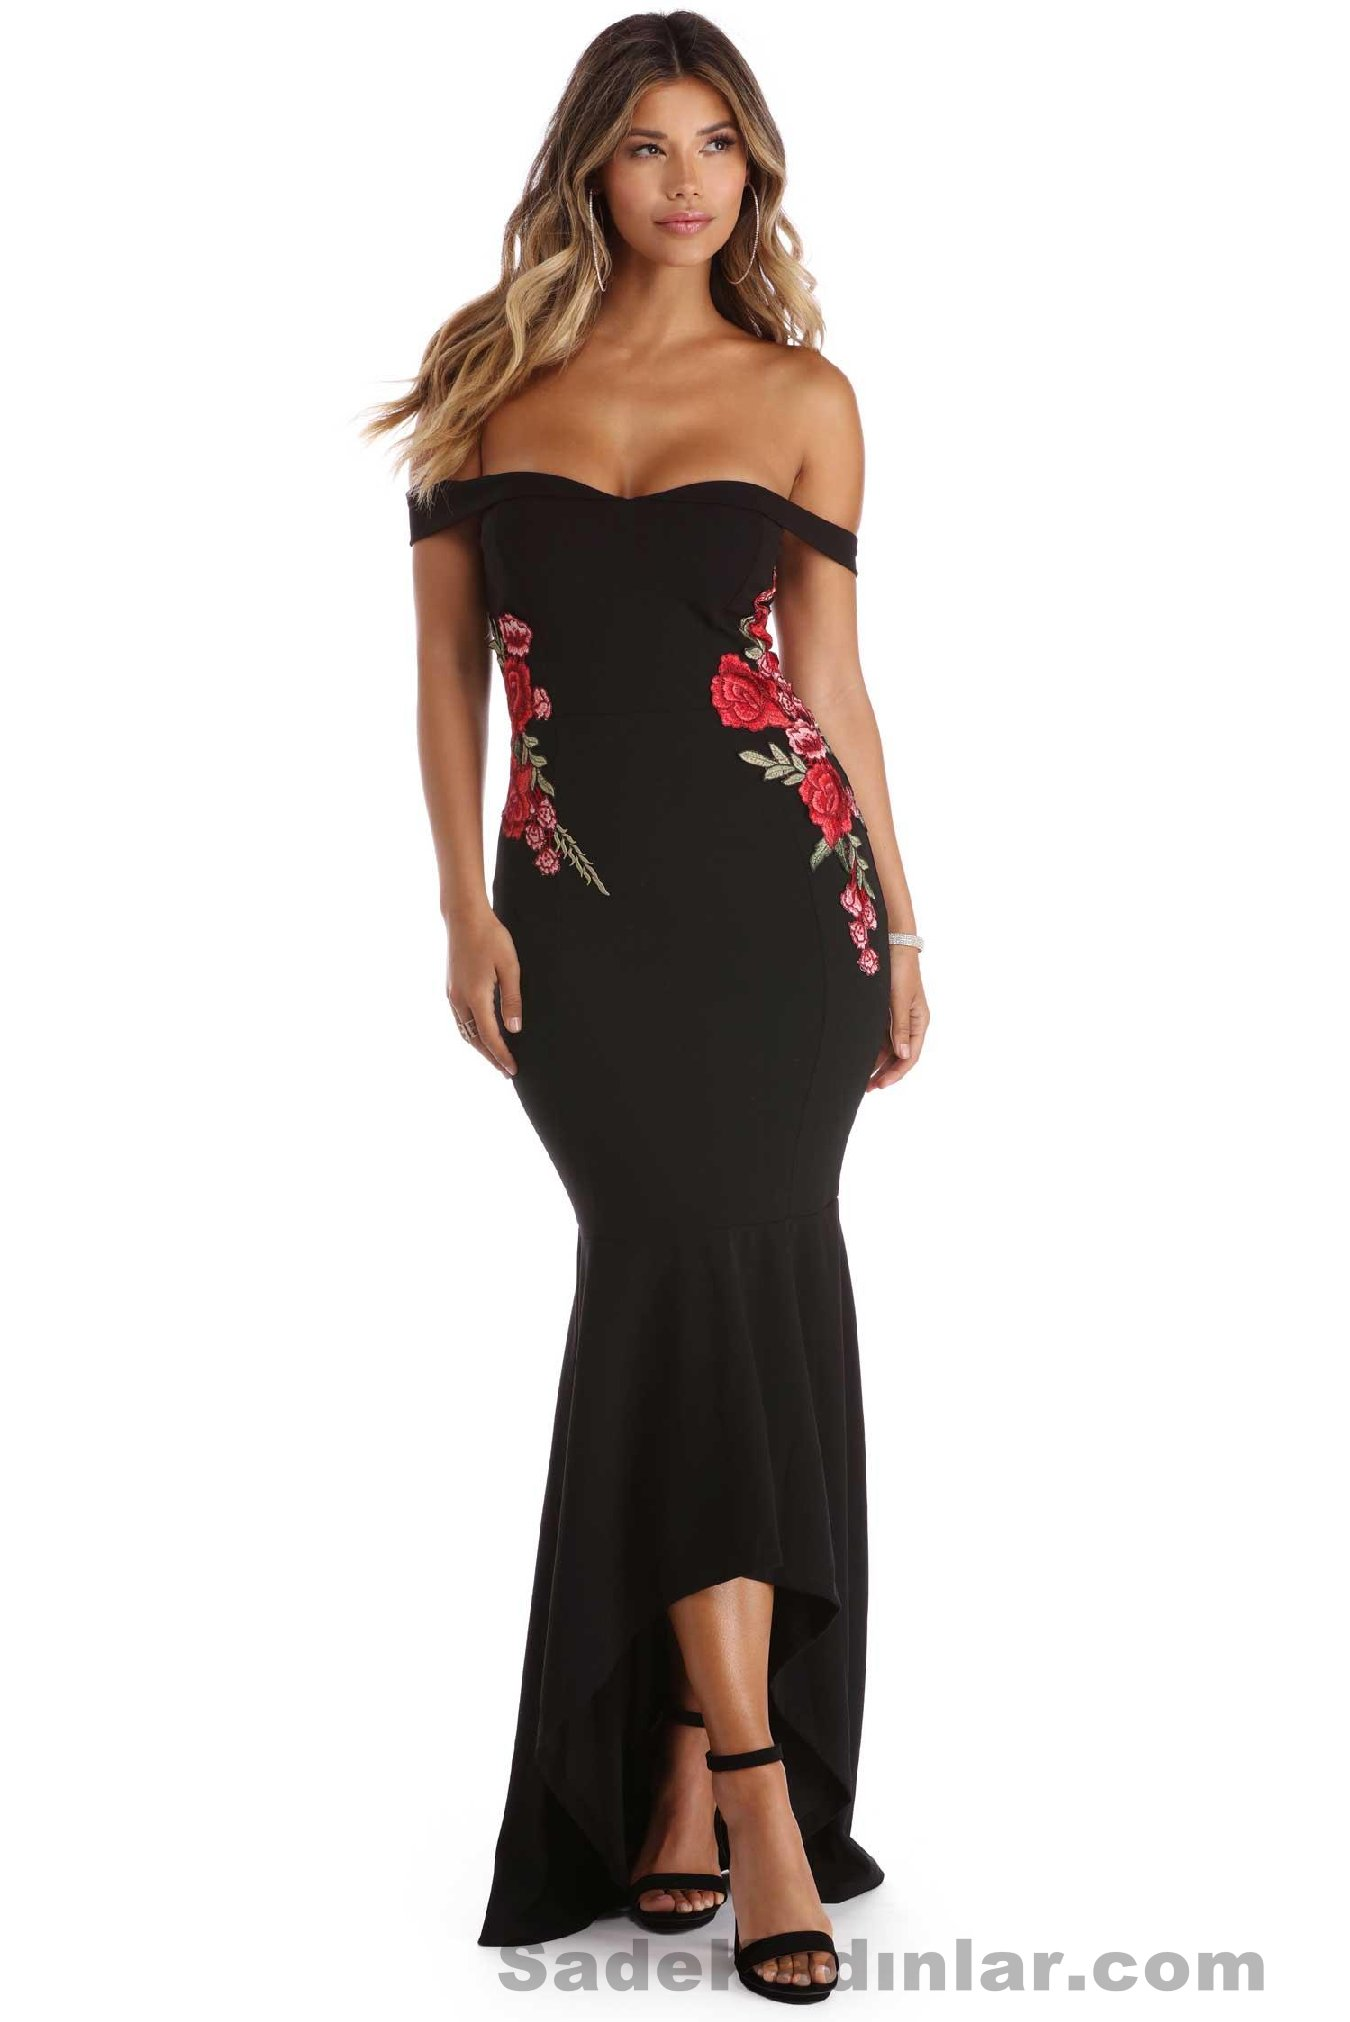 Silvester Kleider 2018 | Kleid & Kleidung